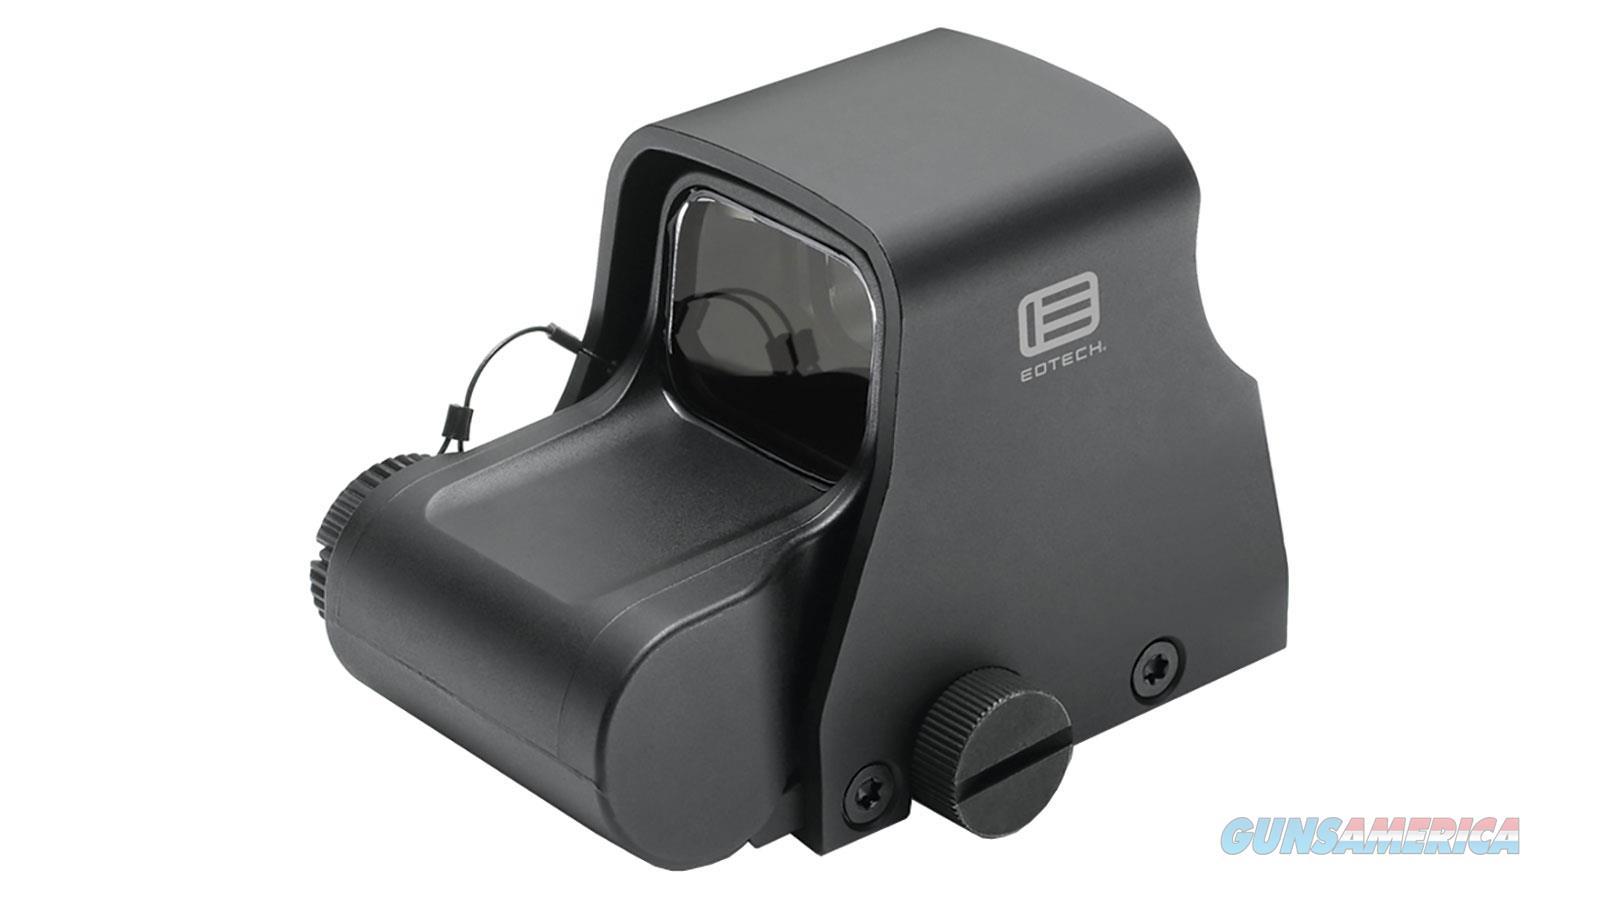 Eo-Tech Xps 3-0 XPS3-0  Non-Guns > Iron/Metal/Peep Sights